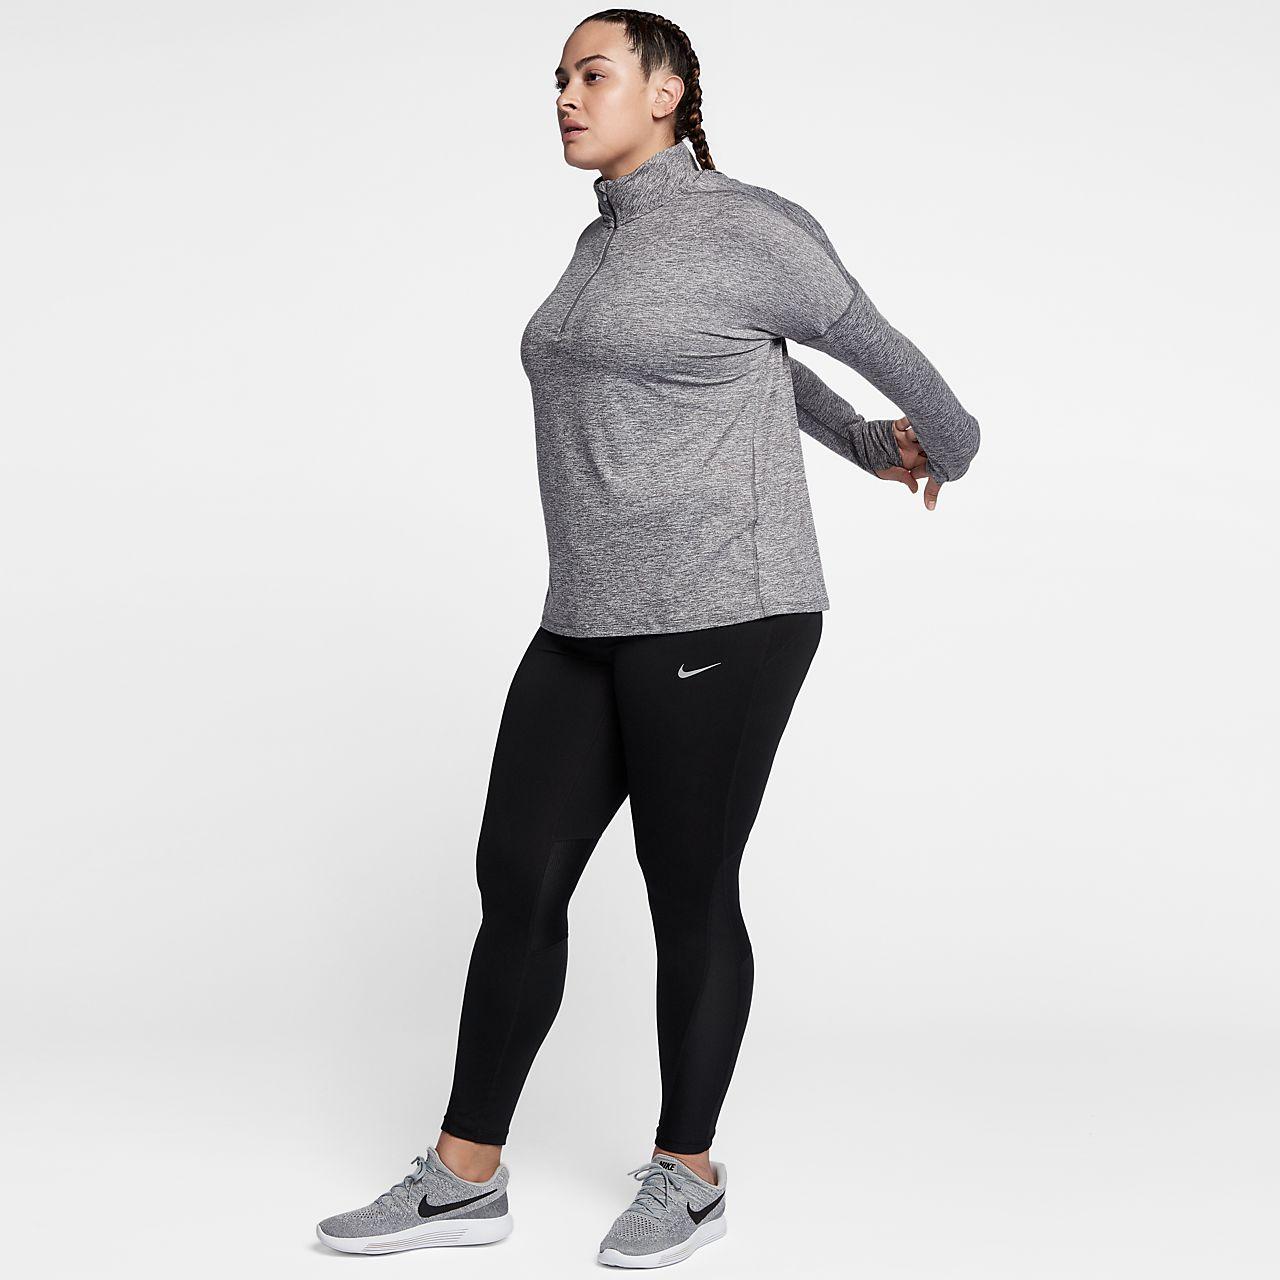 ... Nike Element (Plus Size) Women's Running Top